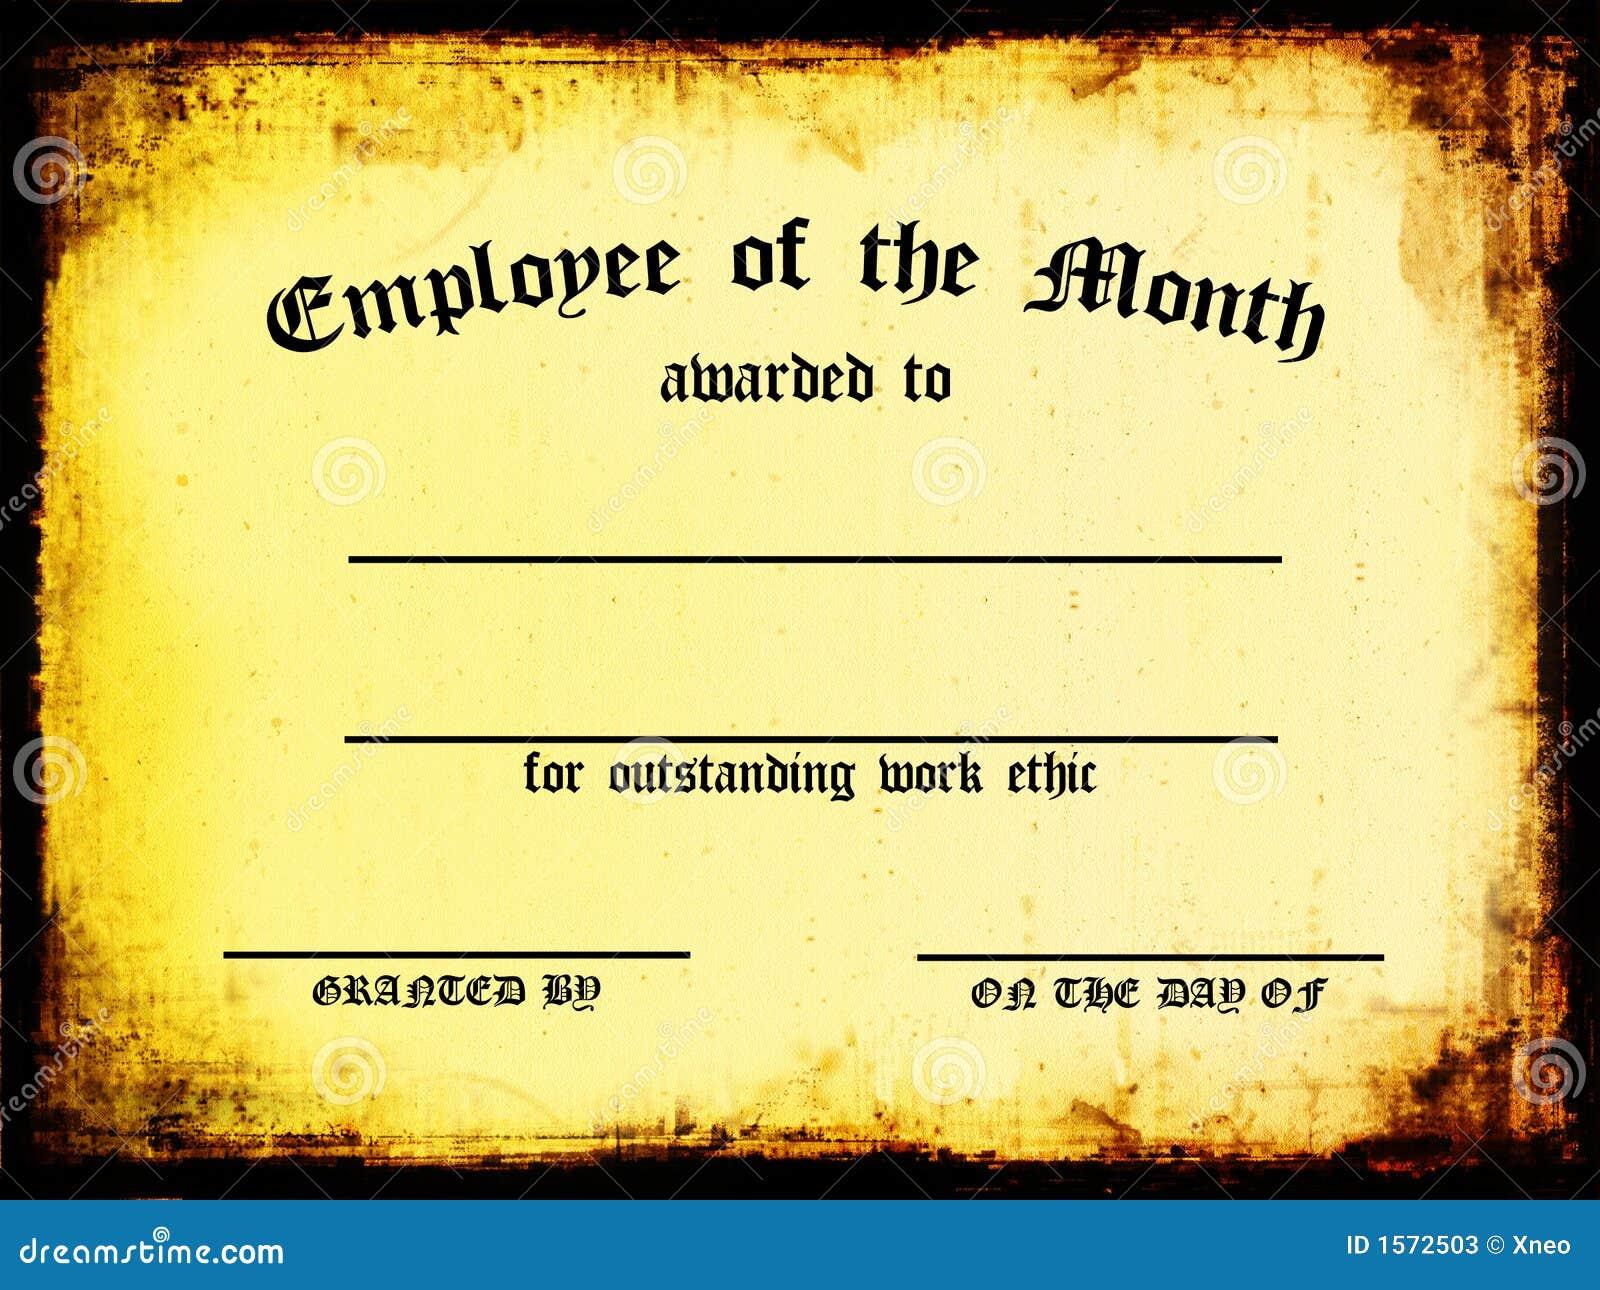 Most Improved Employee Award Demirediffusion